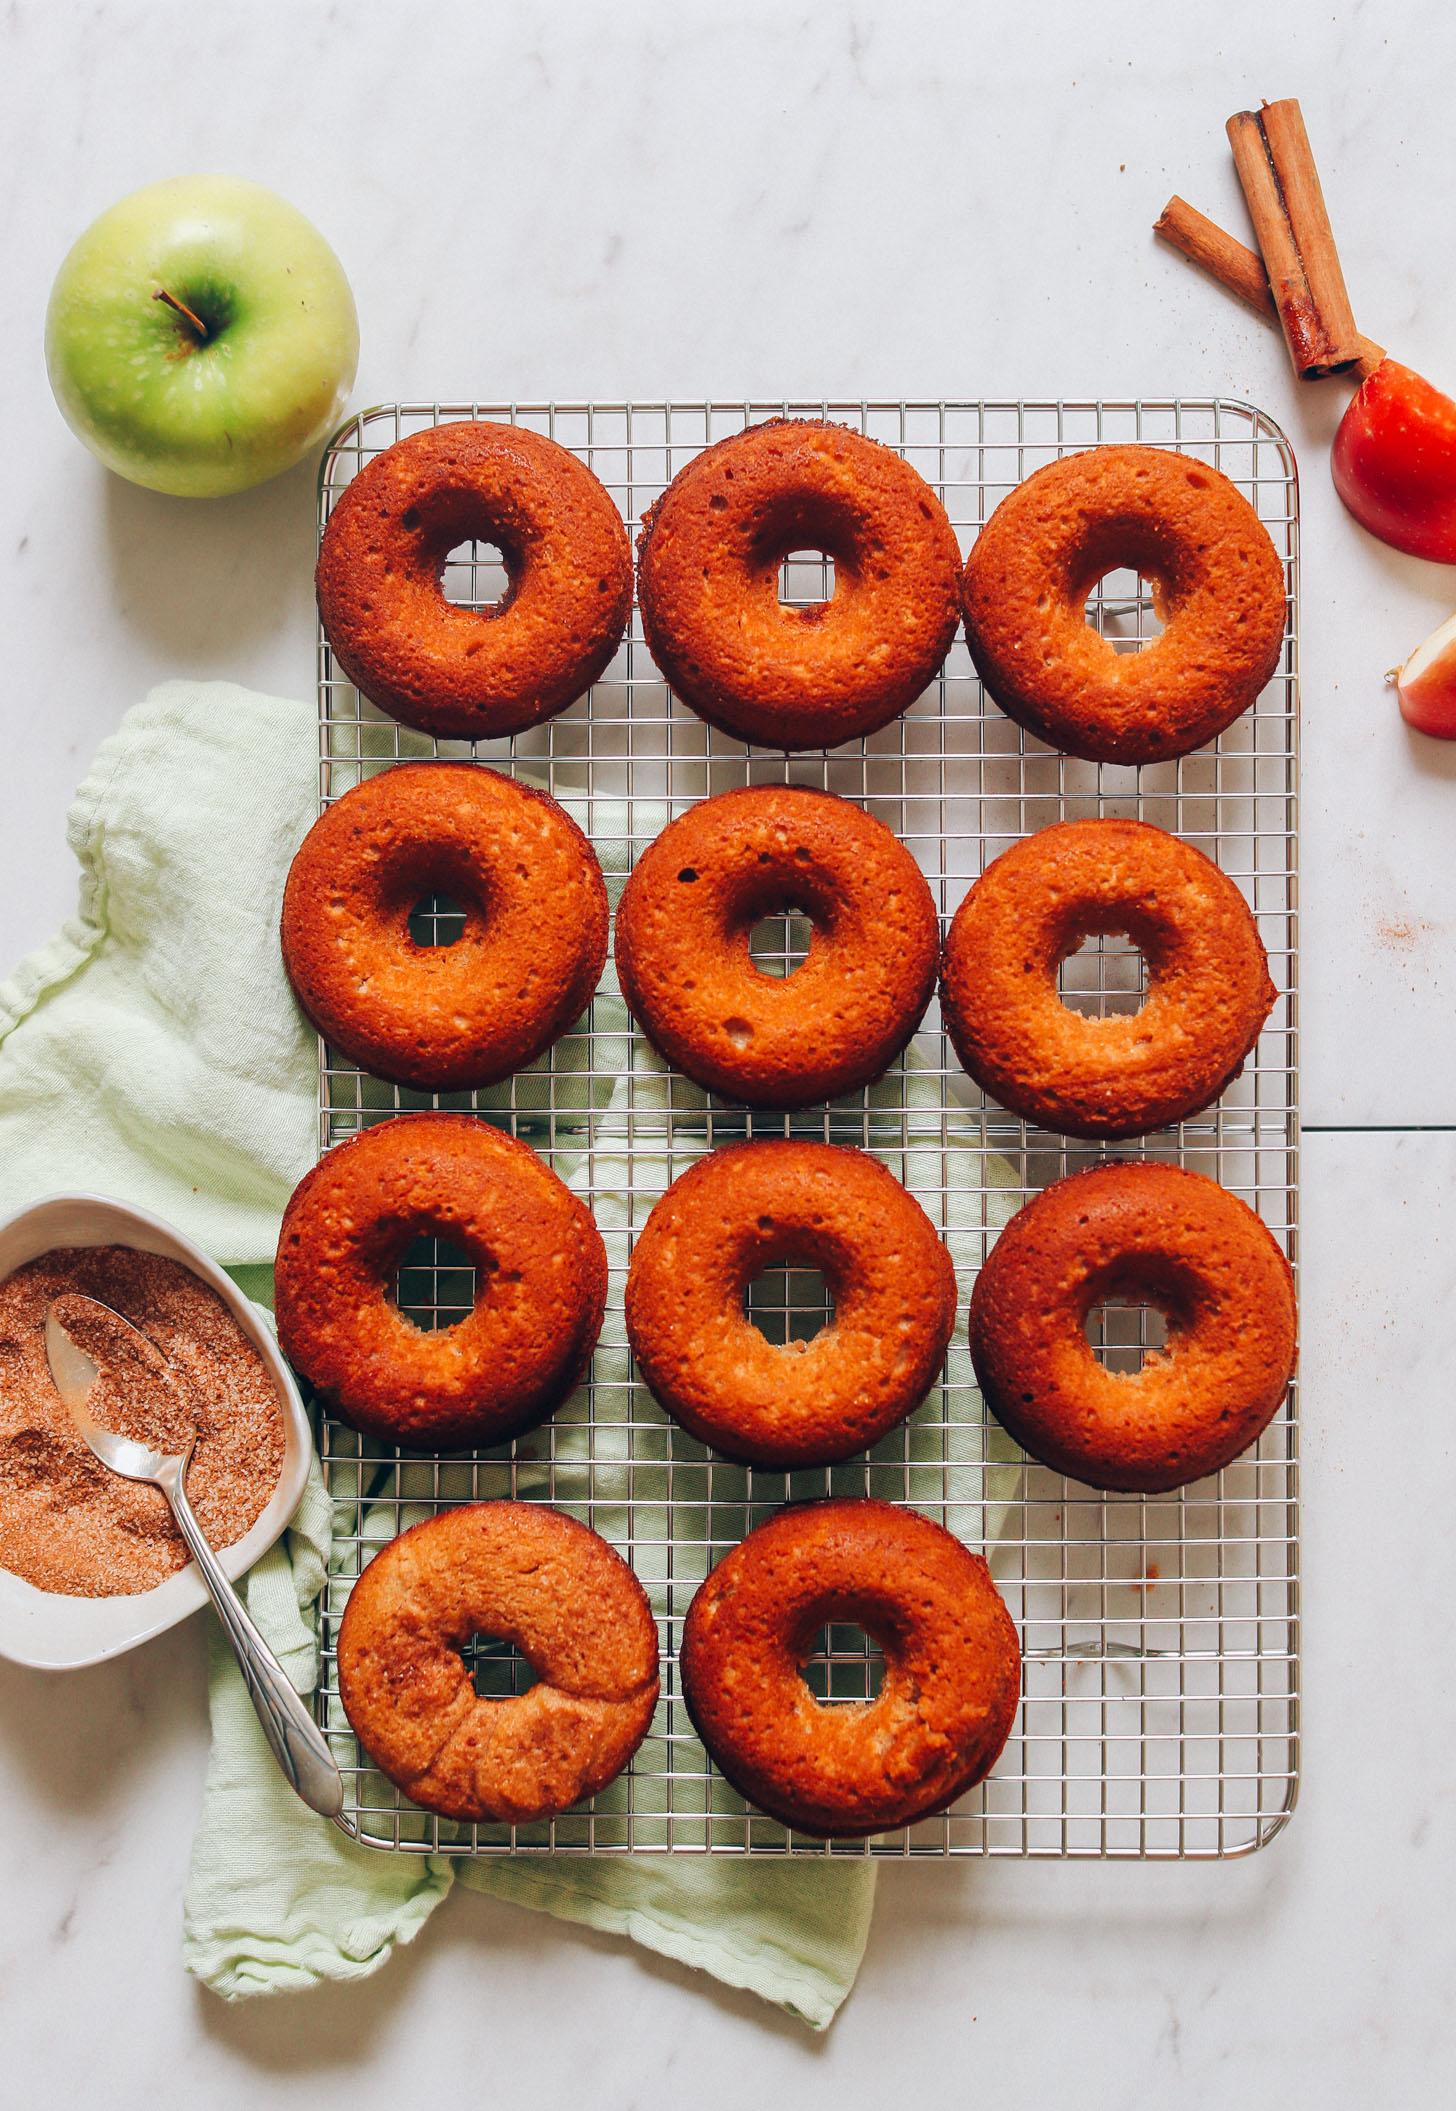 Freshly baked Vegan Gluten-Free Apple Cider Donuts resting on a cooling rack